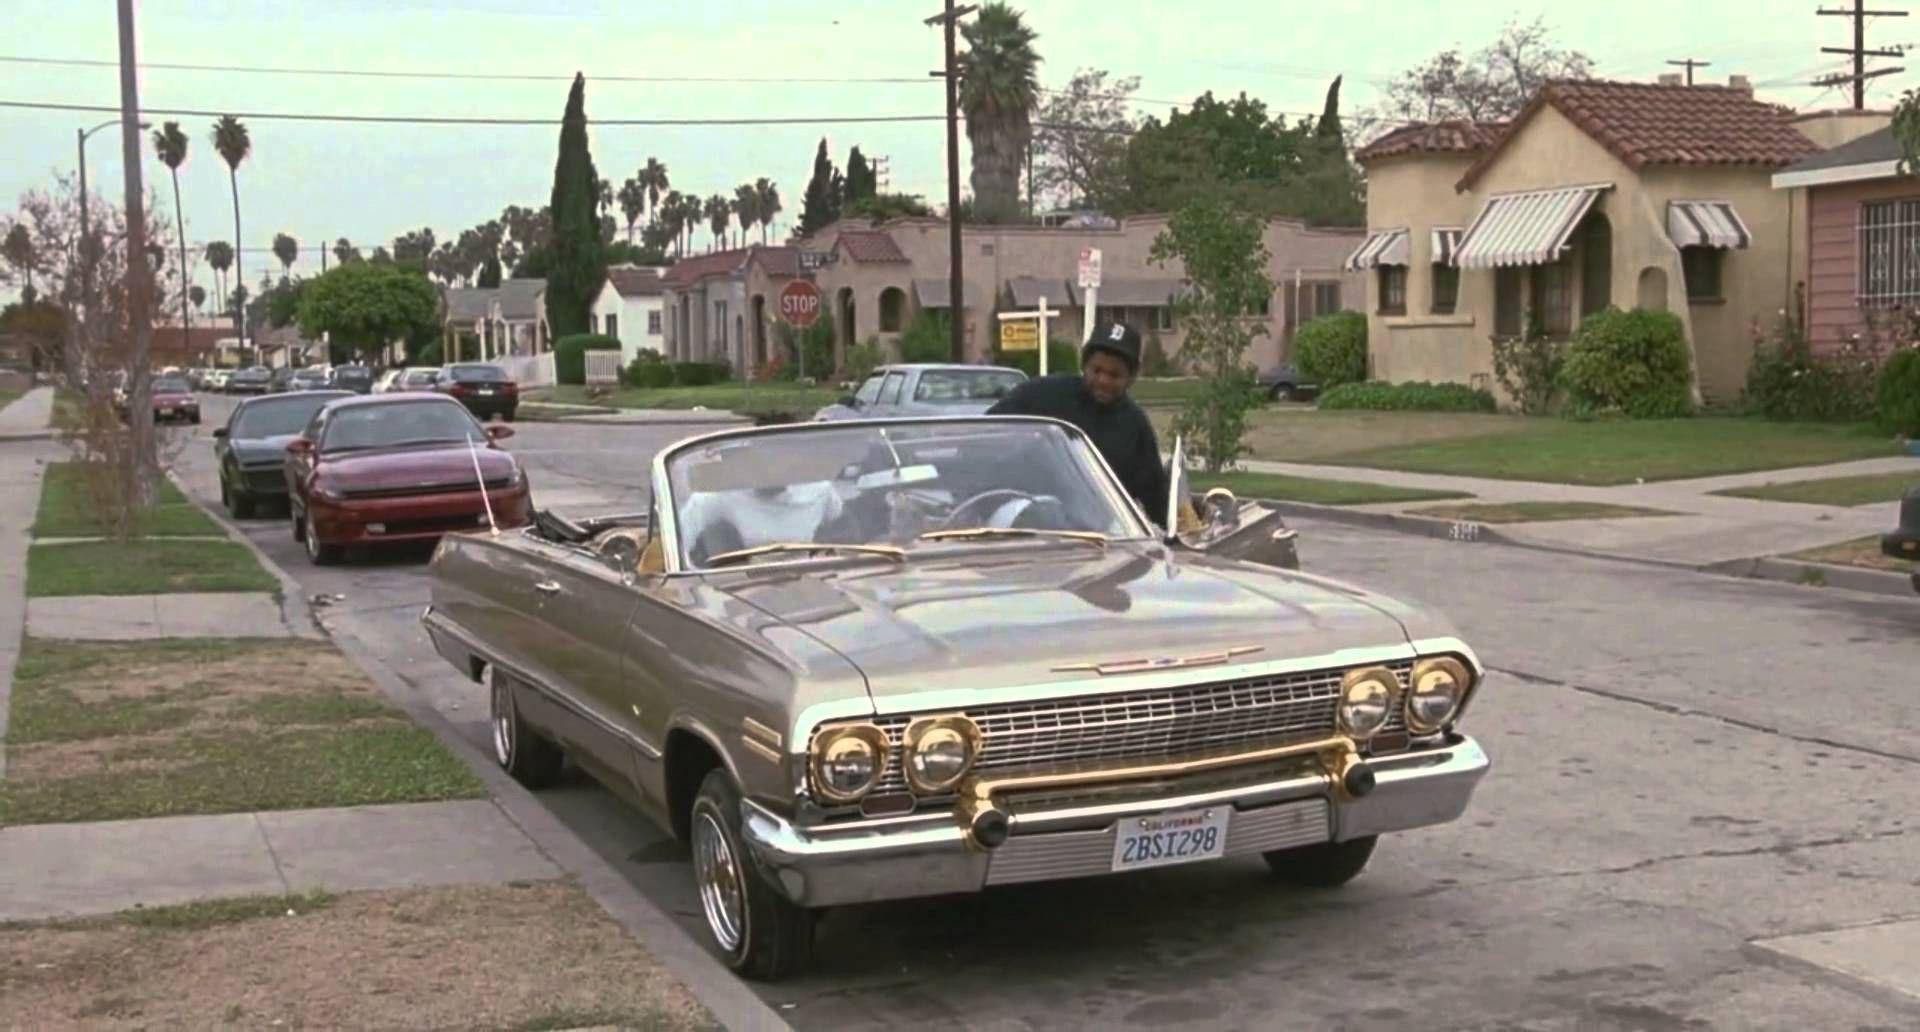 Doughboy S Lowrider 64 Impala Lowrider Chevy Impala Lowriders